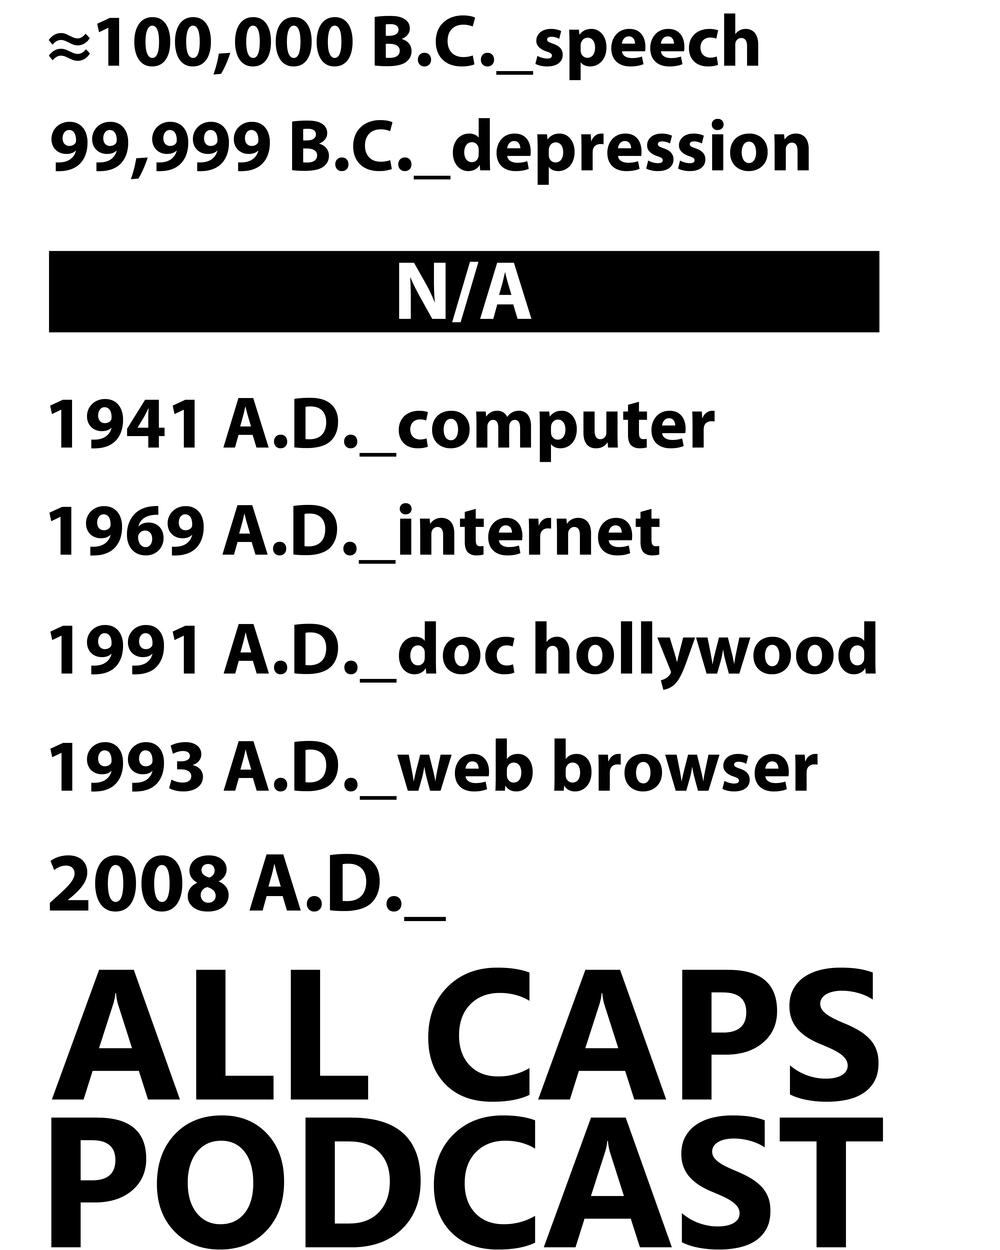 allcapstshirt2.png